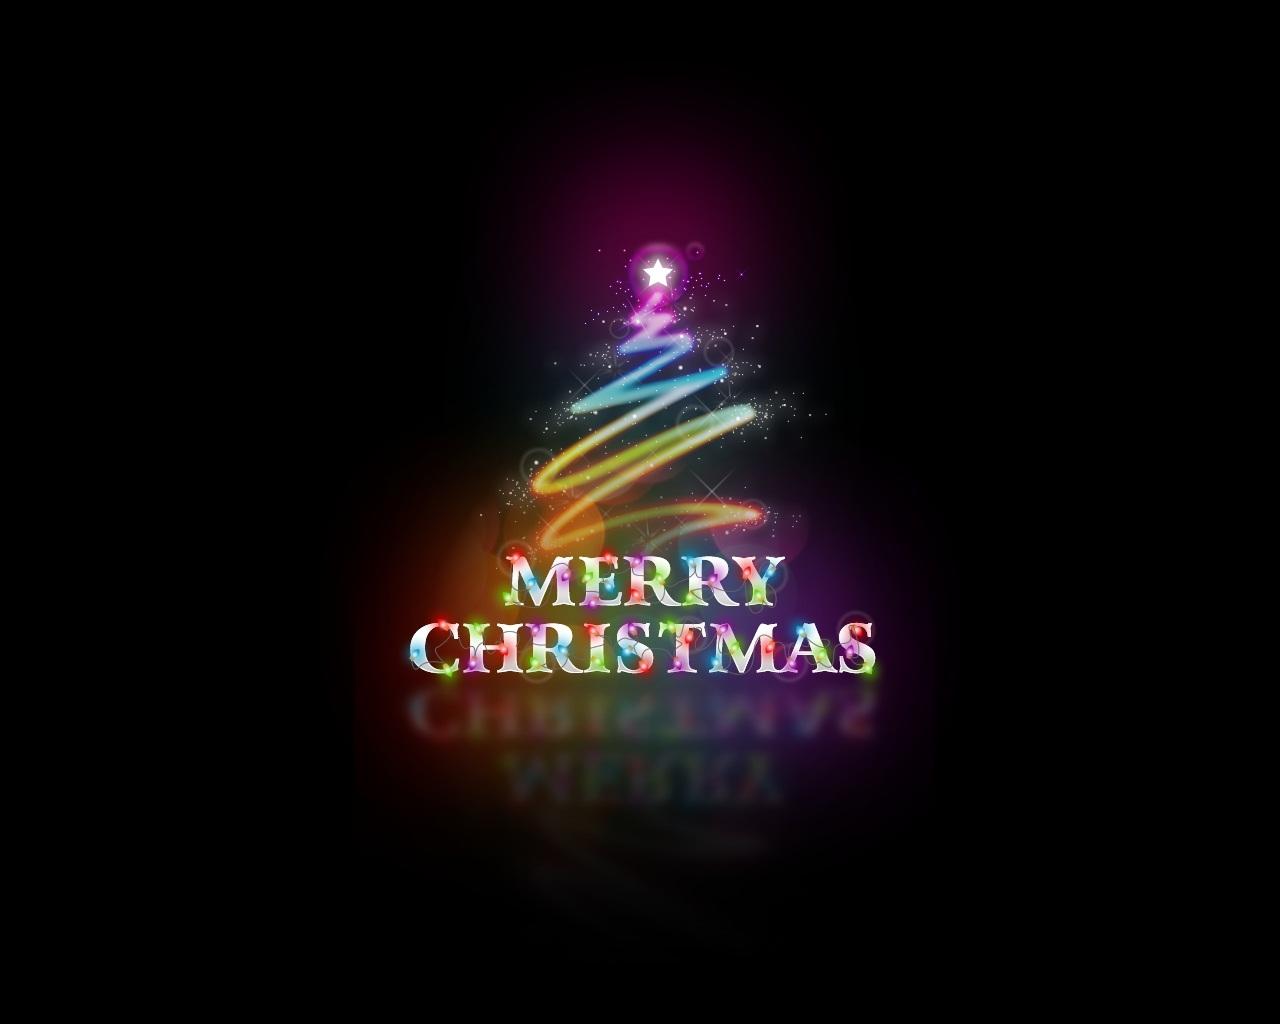 happy merry christmas free wallpaper deskto